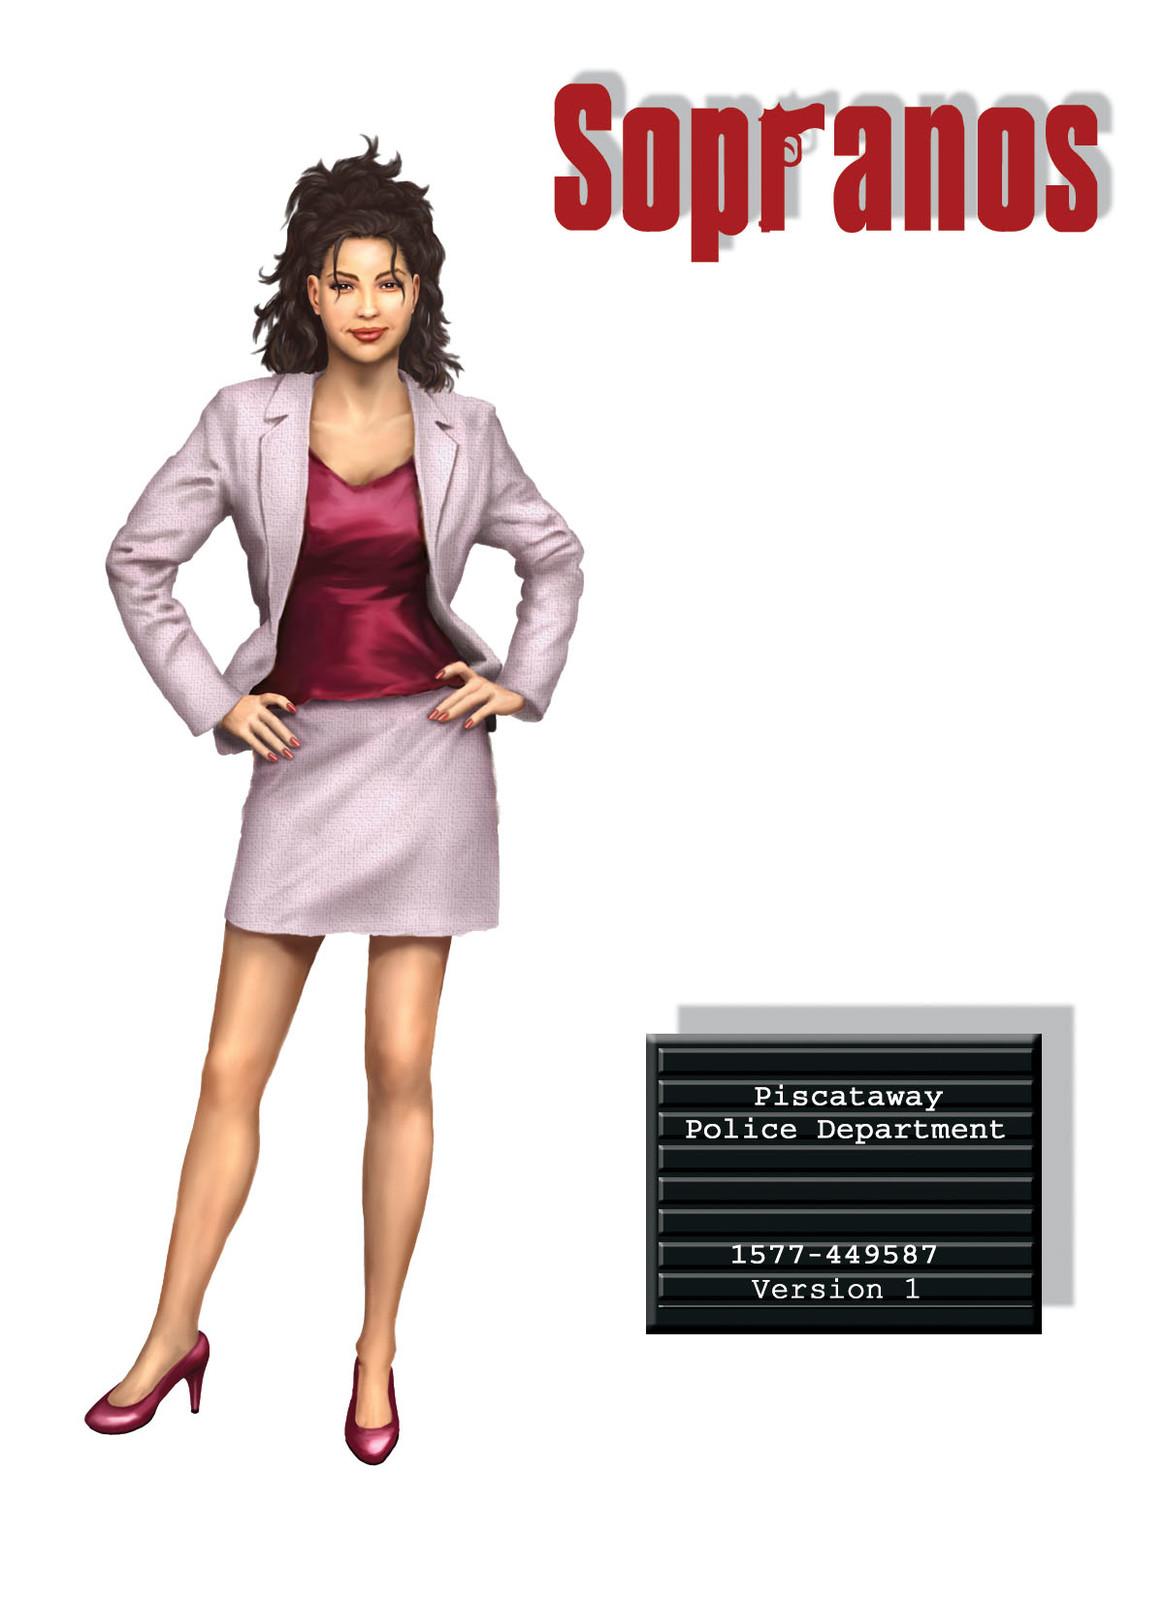 Sopranos Game: Primary NPCs